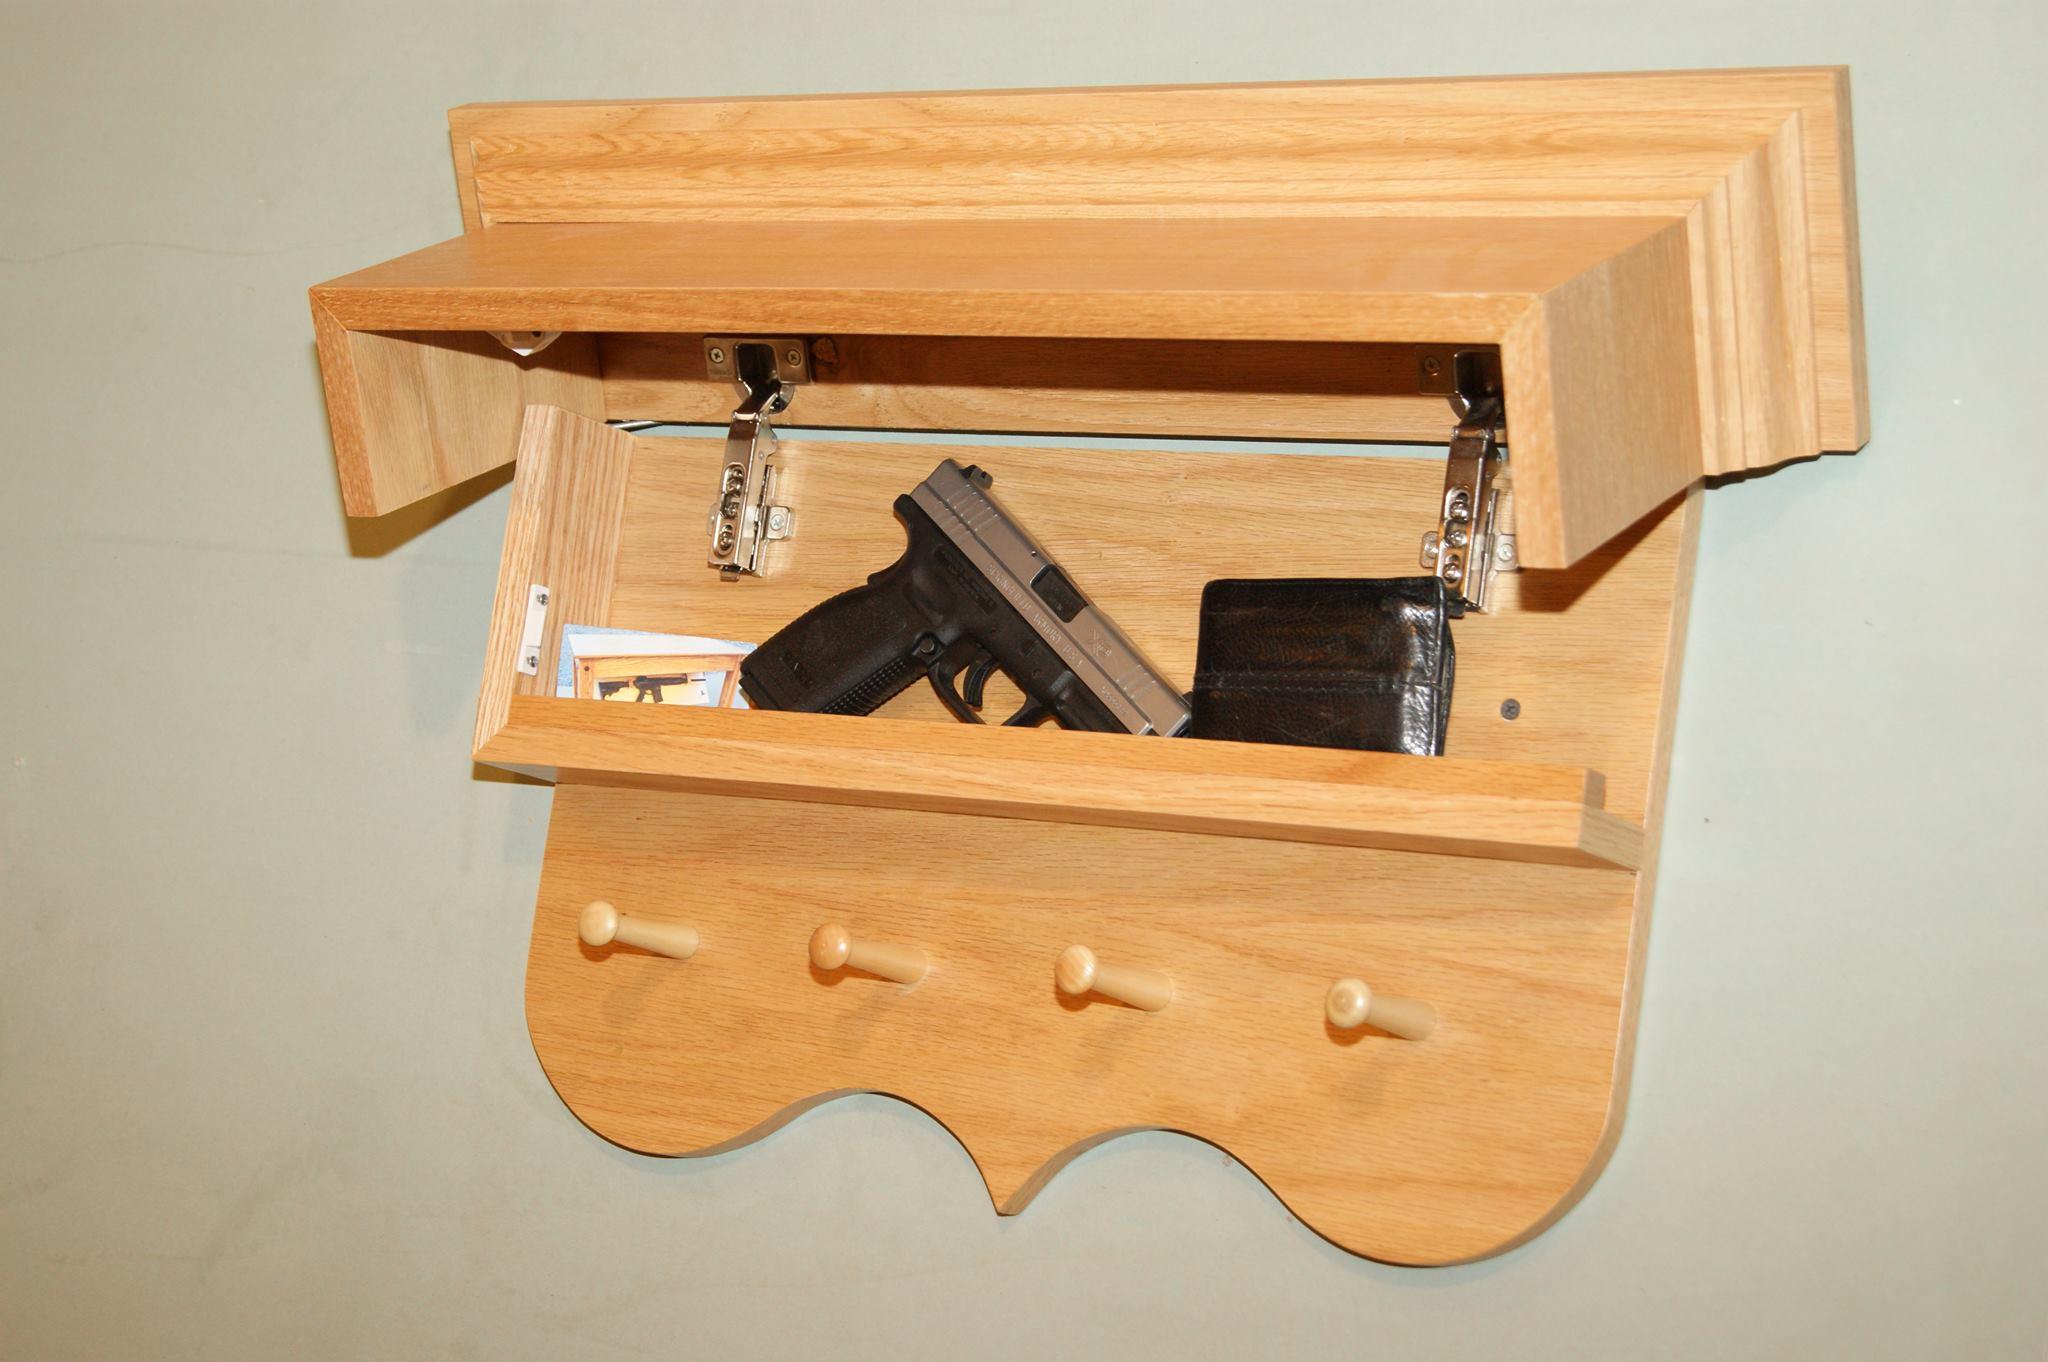 Best ideas about Secret Compartment Furniture DIY . Save or Pin Secret partment in Coat Rack Now.